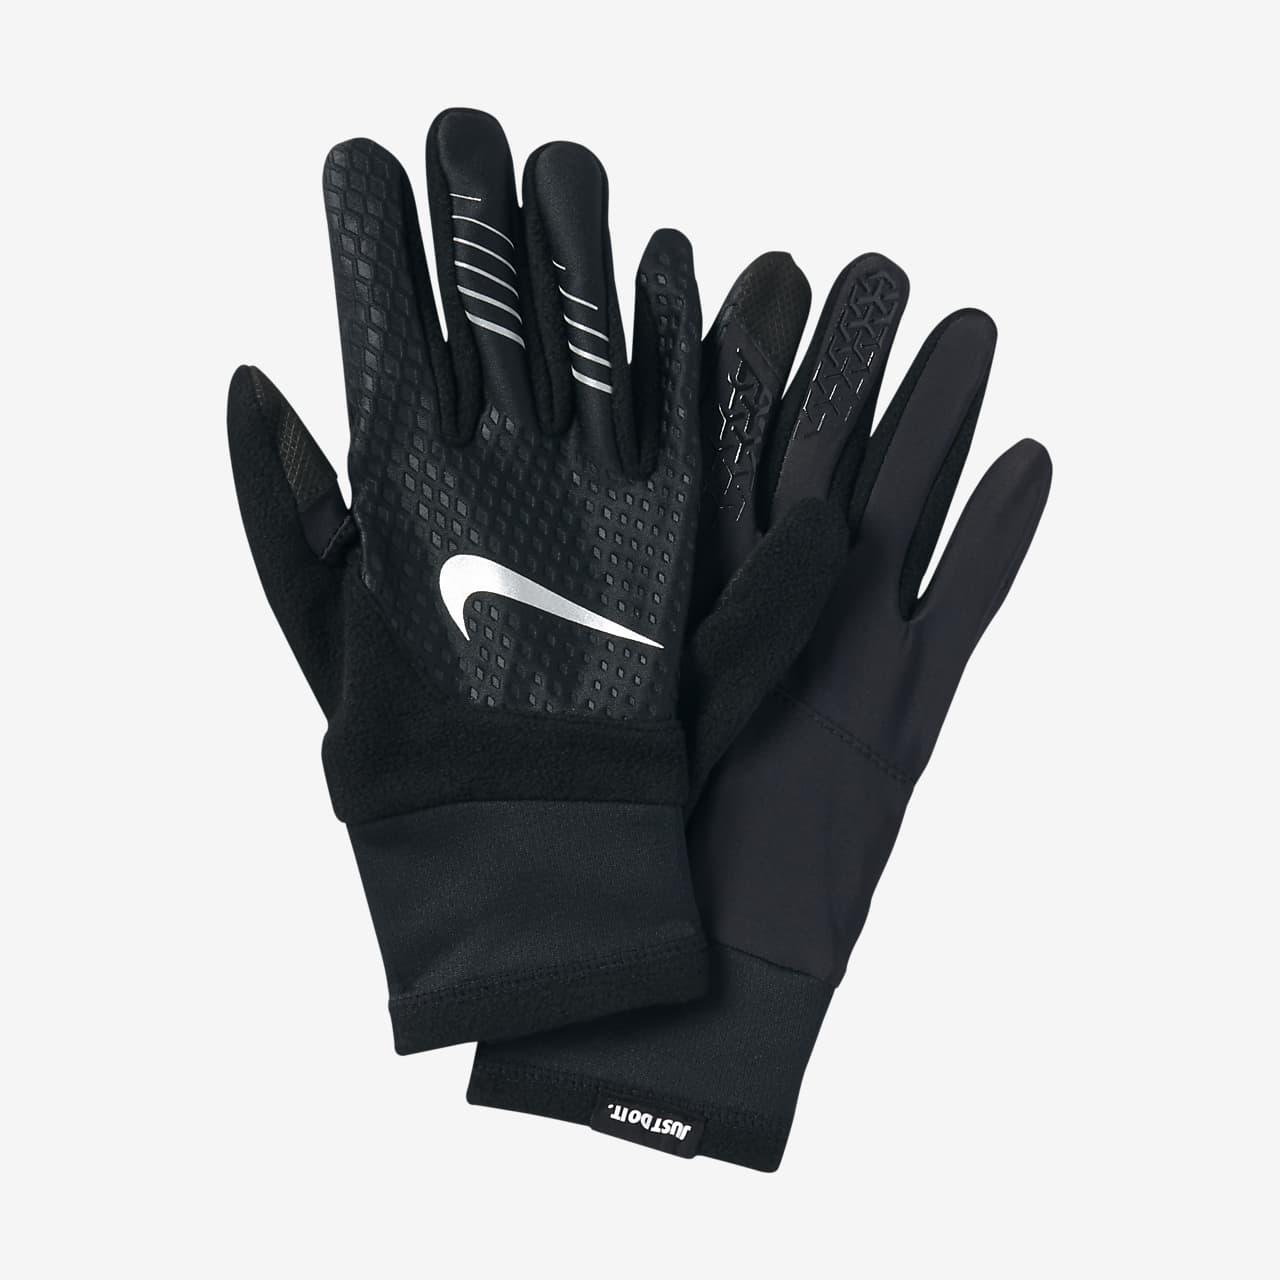 Nike Therma-FIT Elite 2.0 Women's Running Gloves